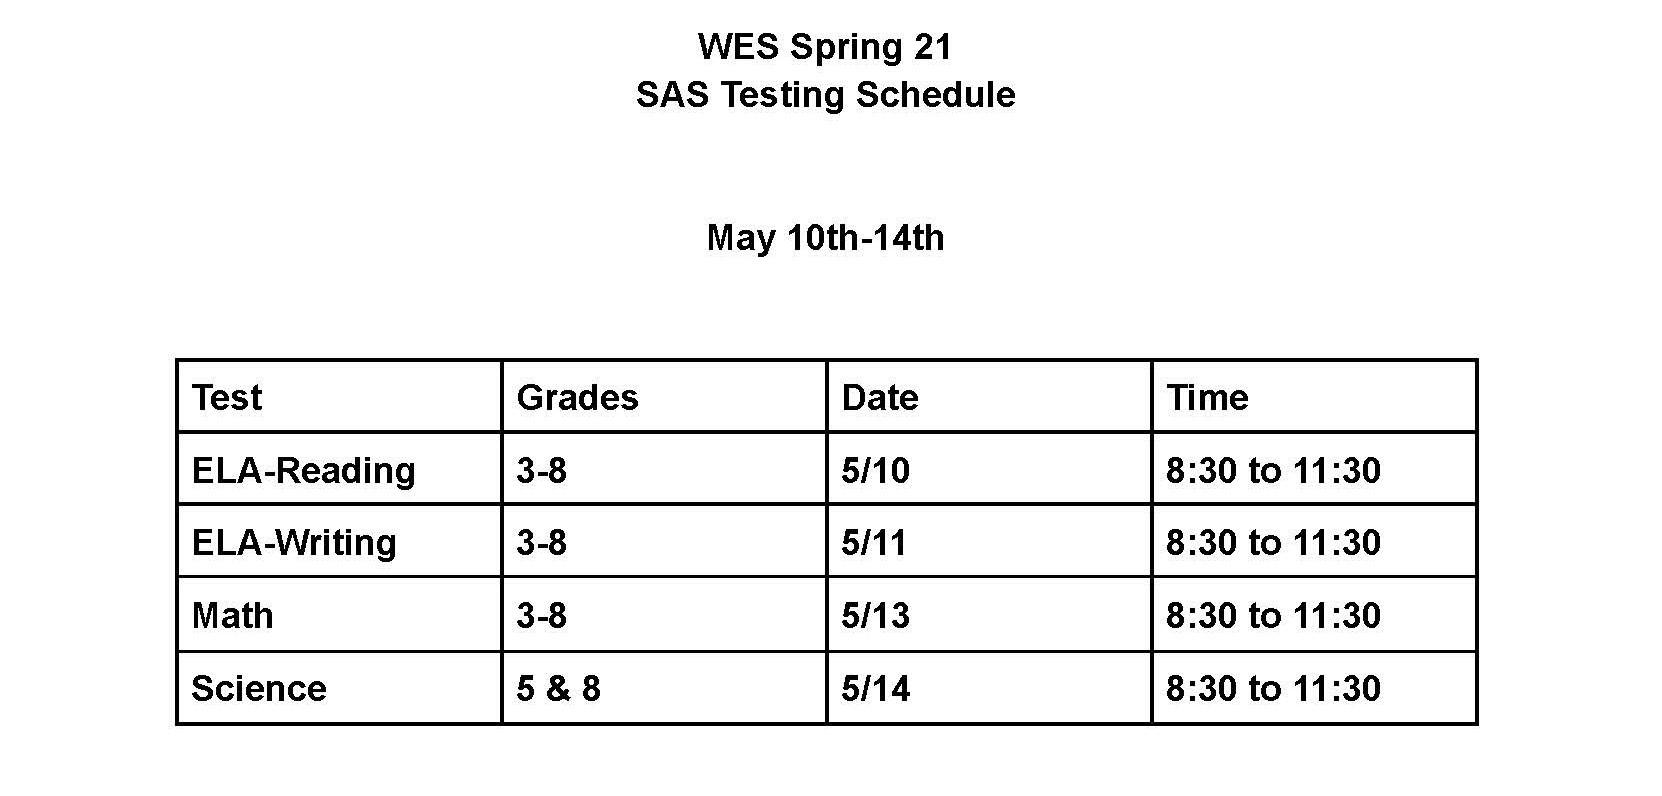 SAS Testing Schedule